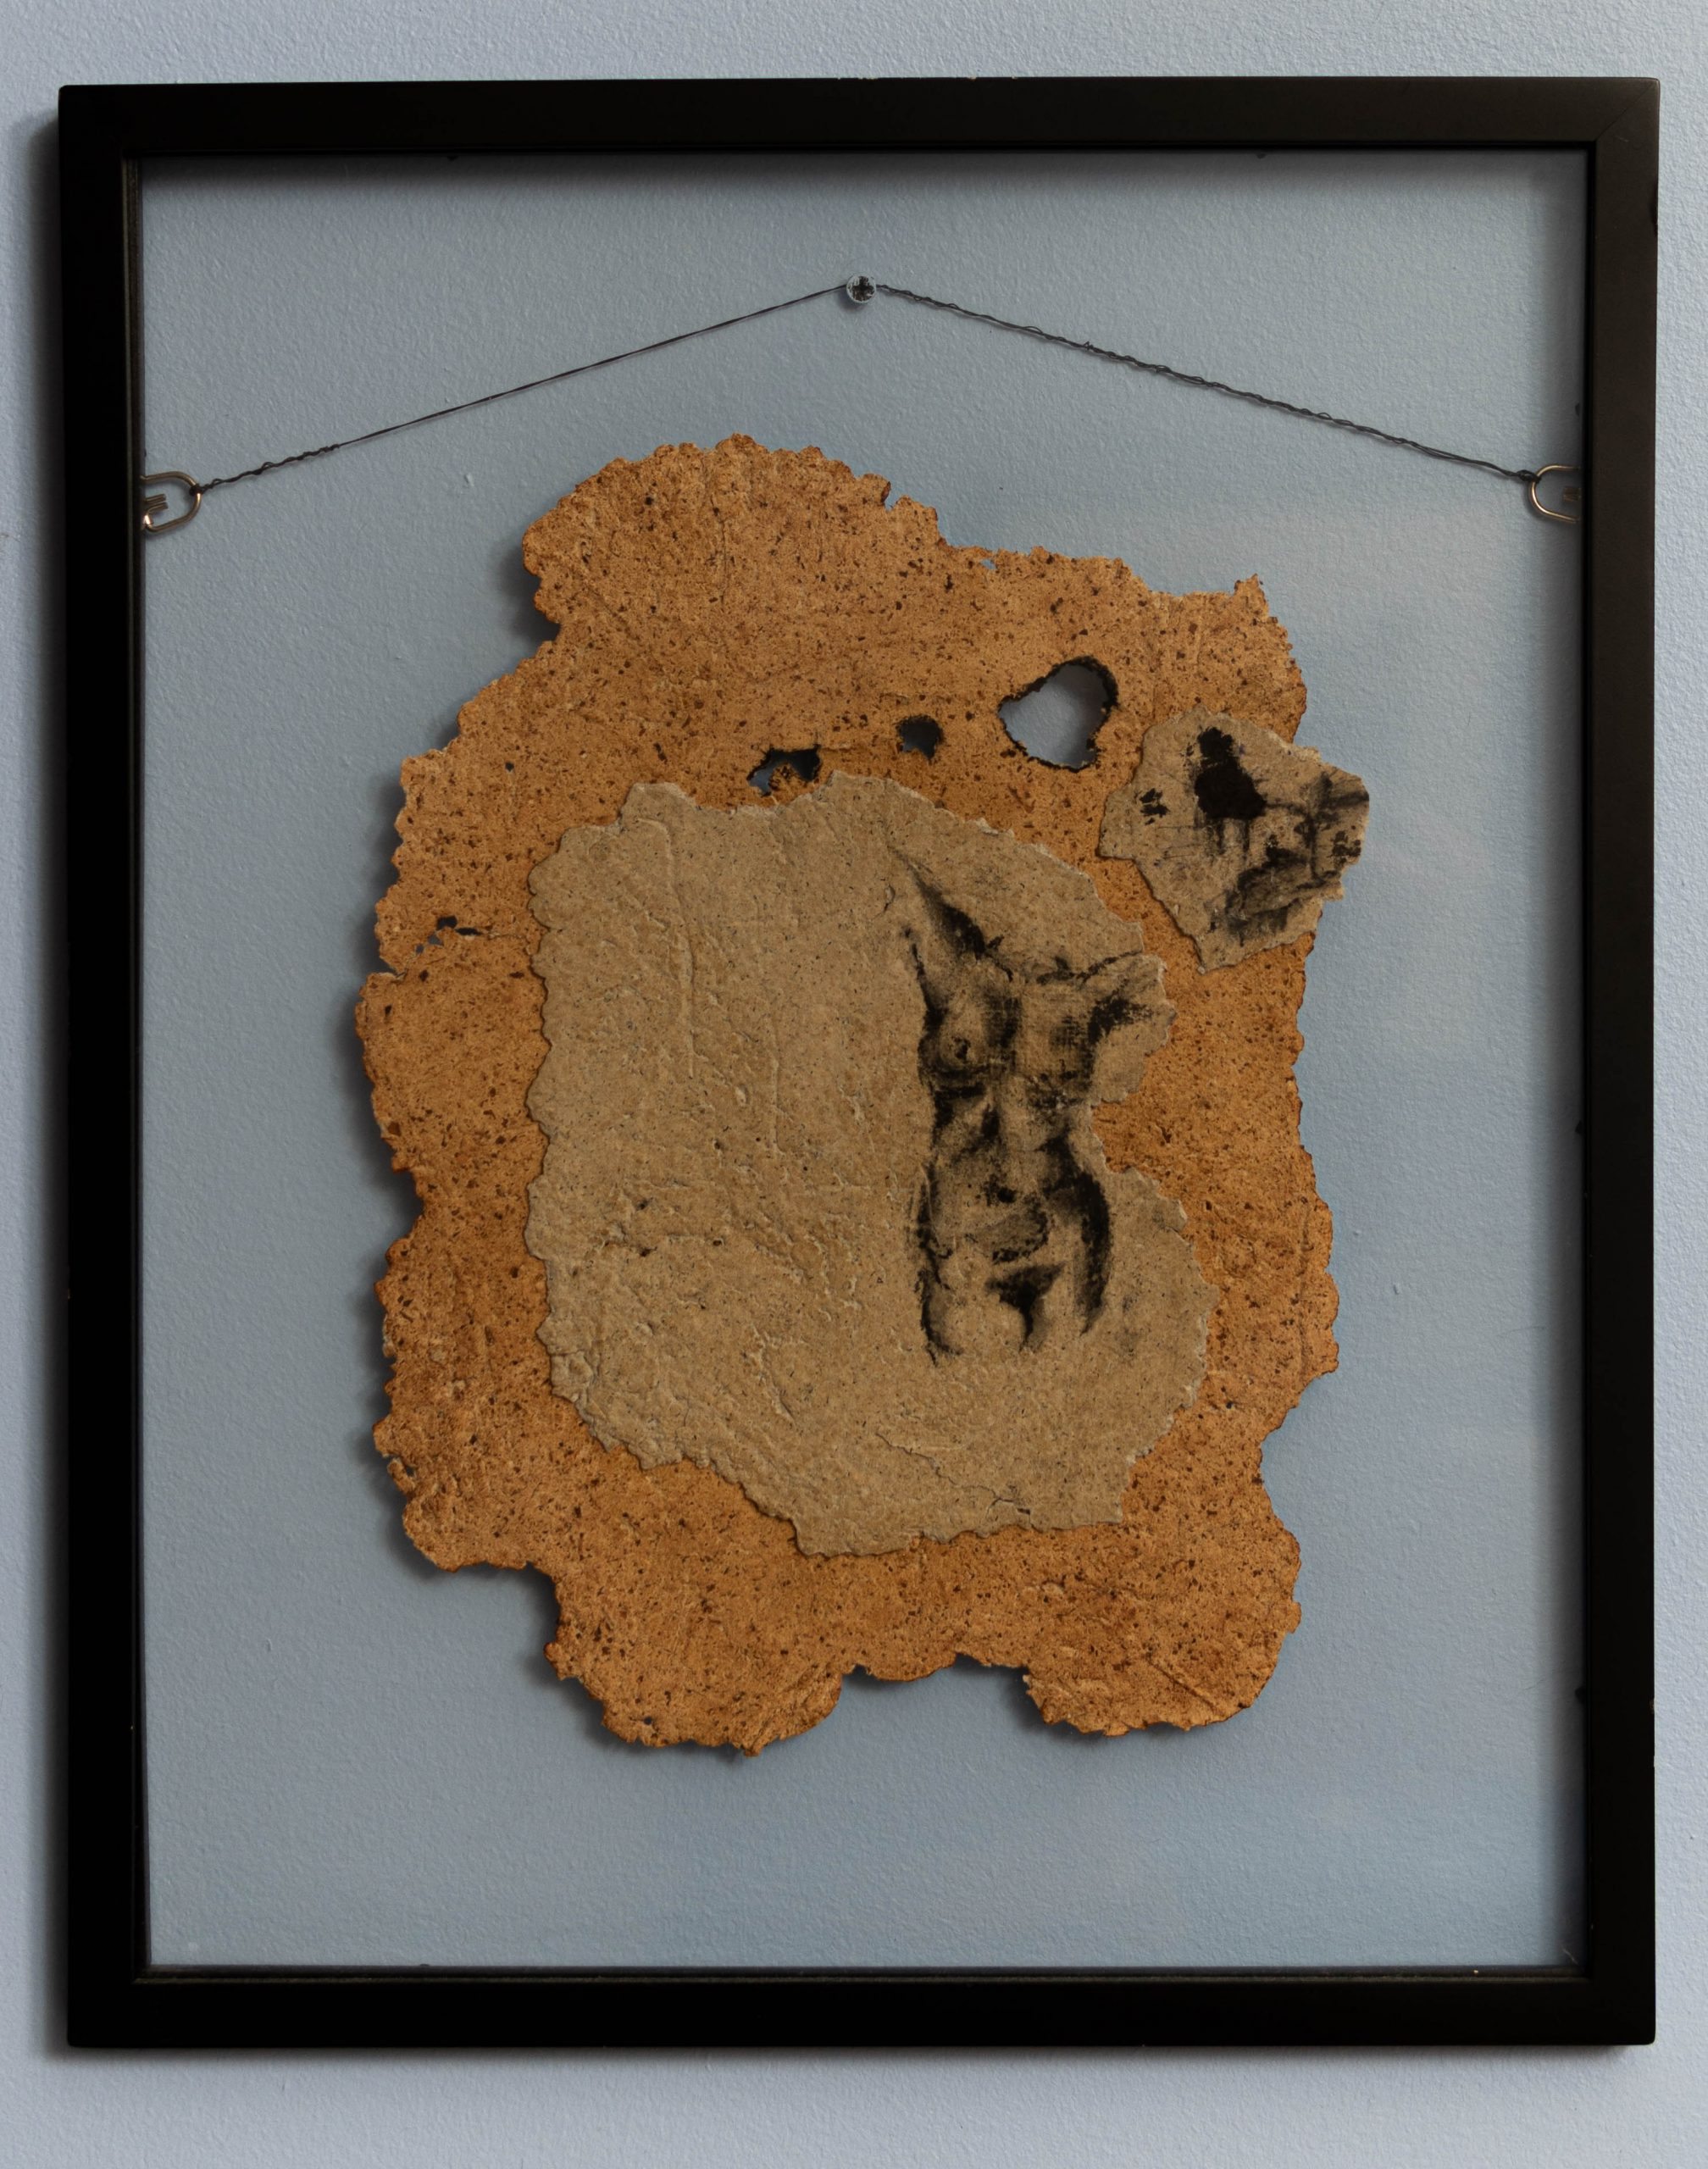 Bare skin, 2013, paper pulp, ink, 17